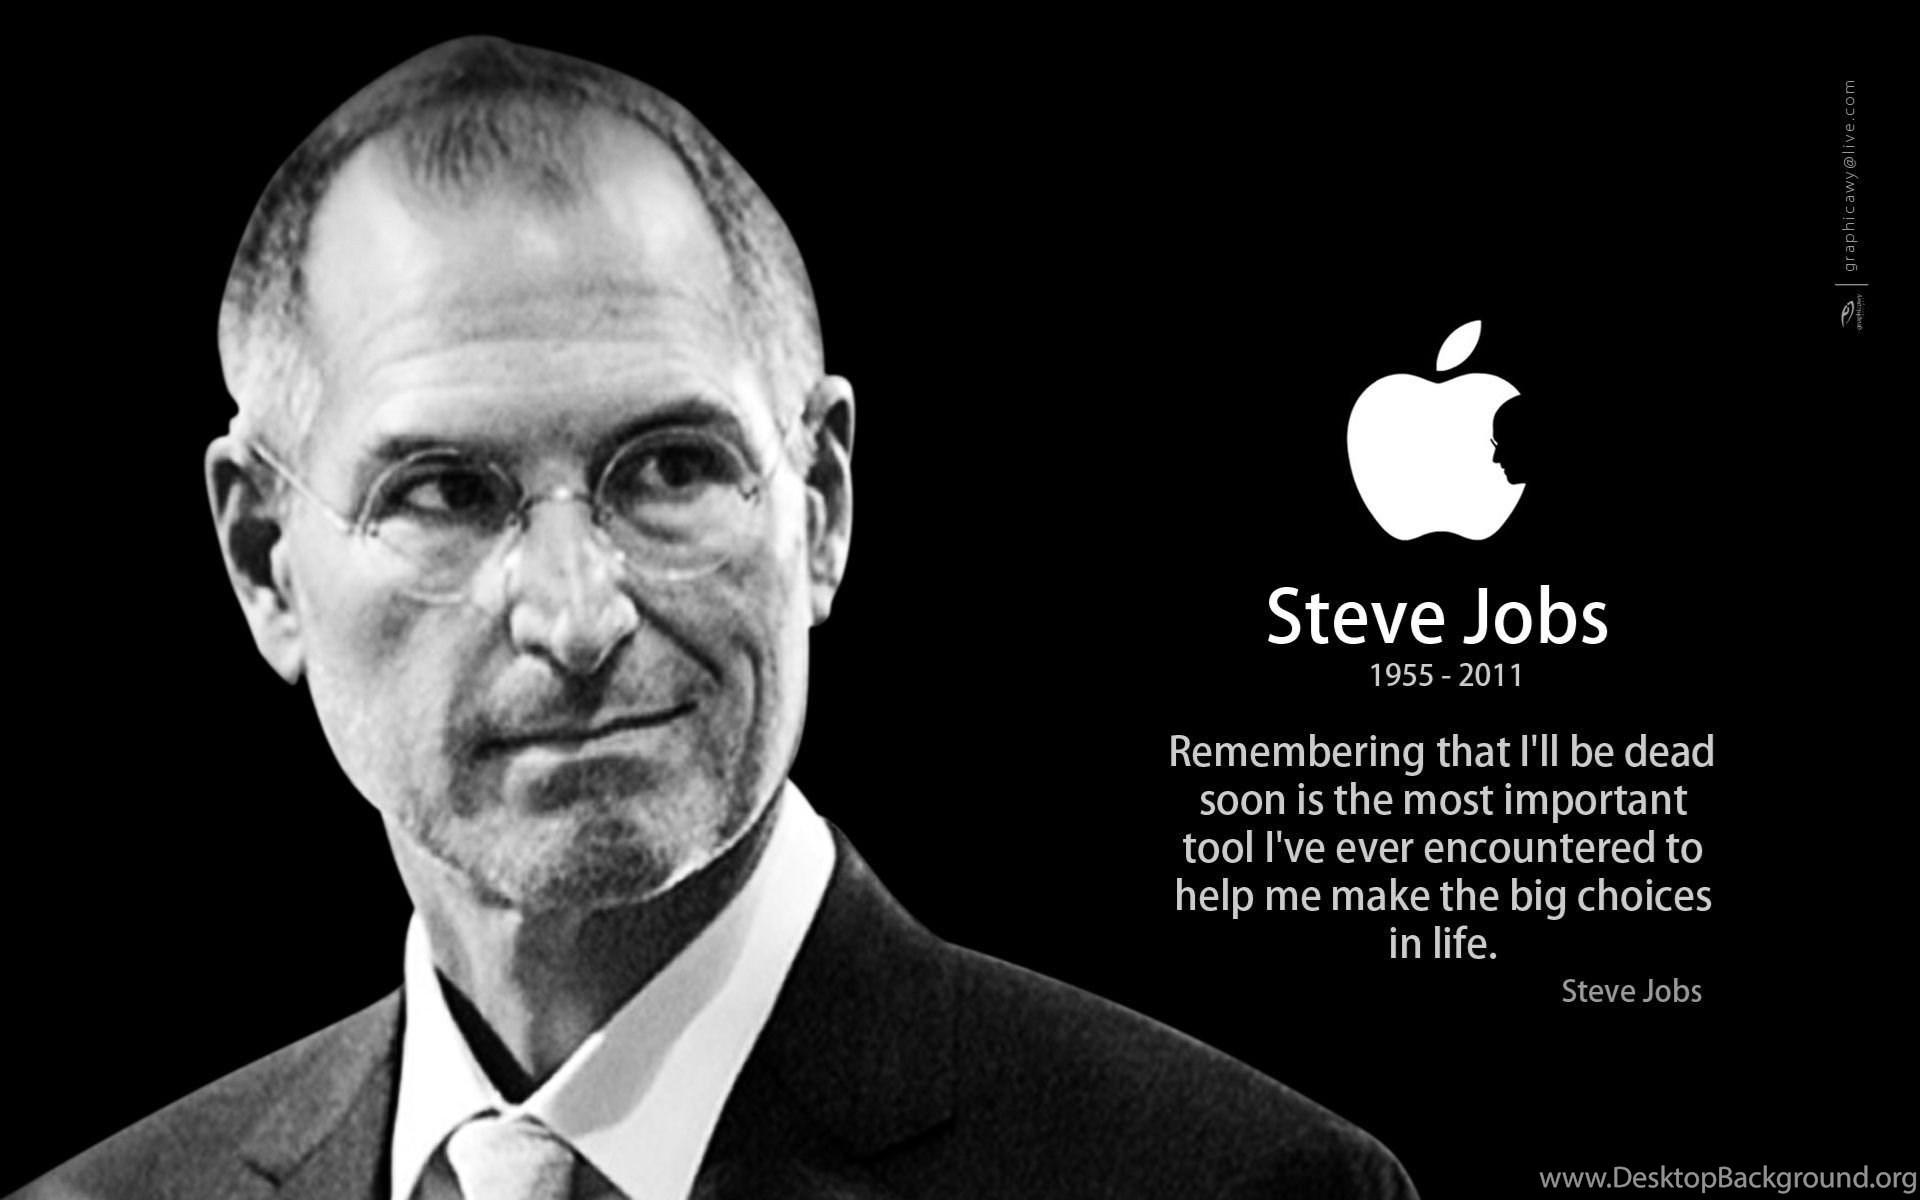 Steve jobs wallpapers hd wallpapers desktop background - Steve jobs wallpaper download ...